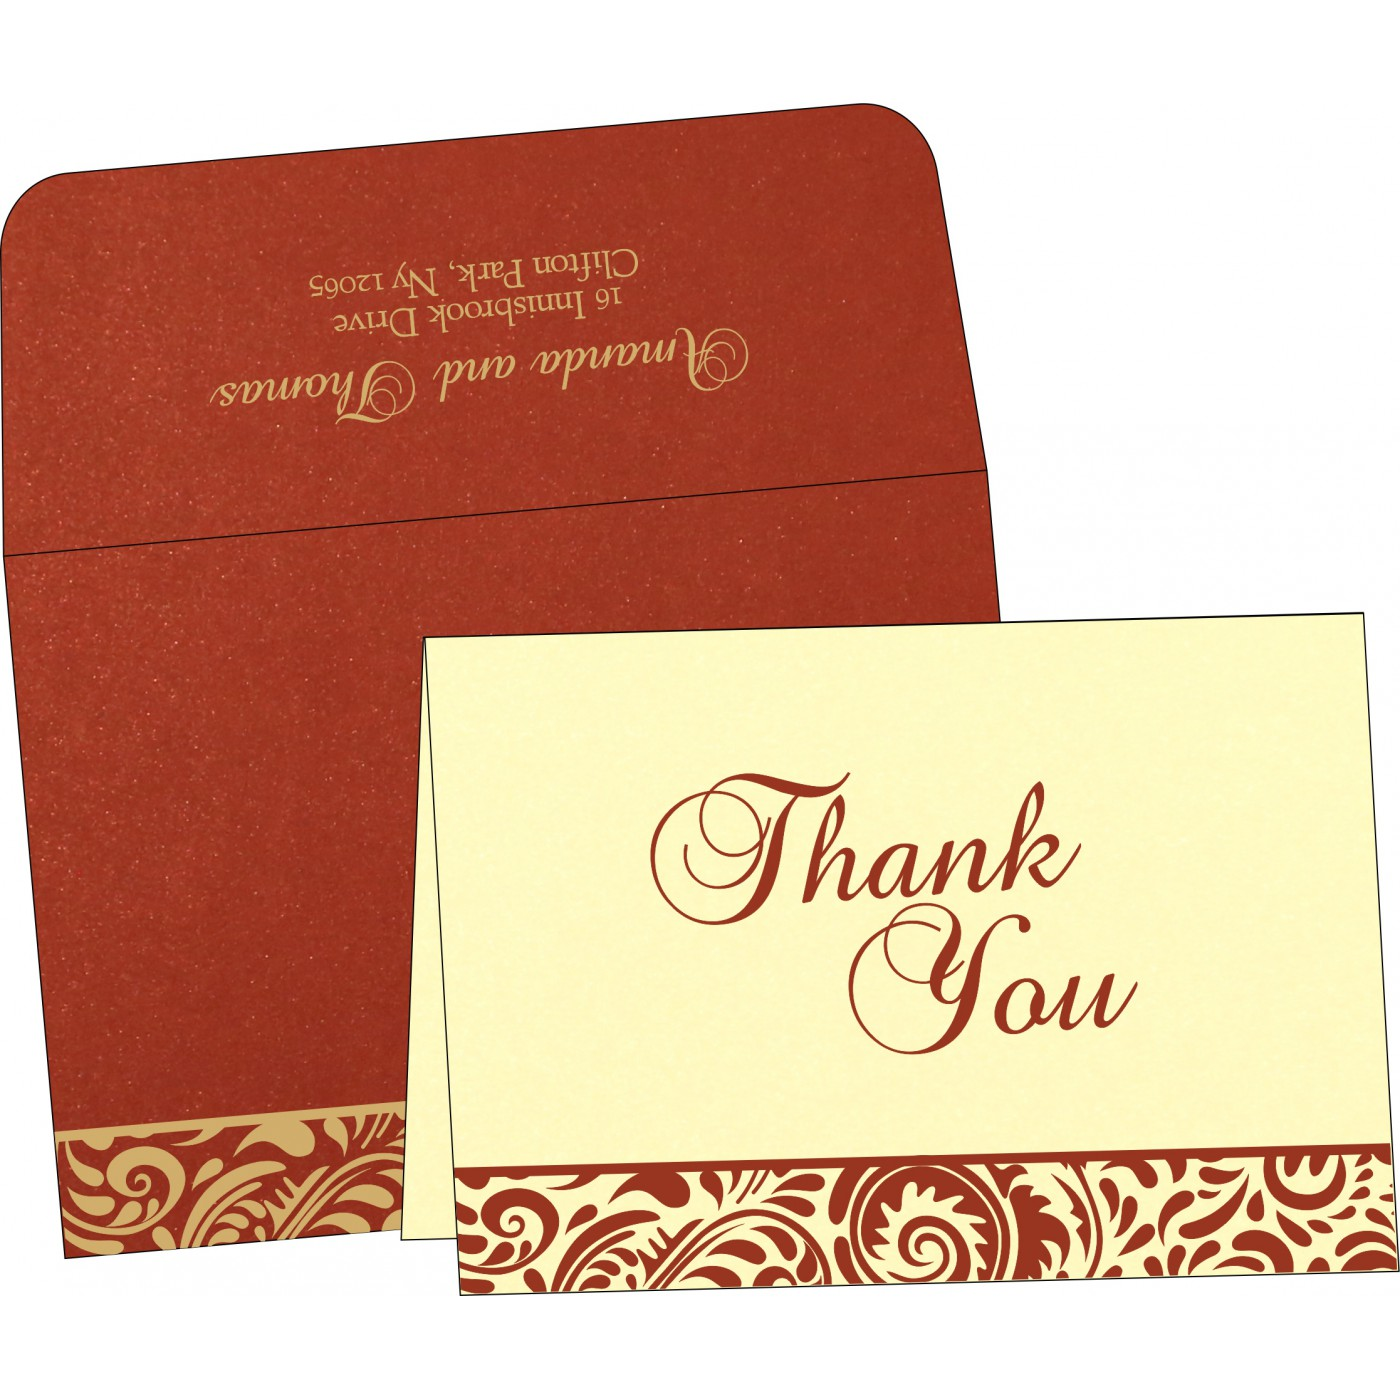 Thank You Cards : TYC-1471 - 123WeddingCards